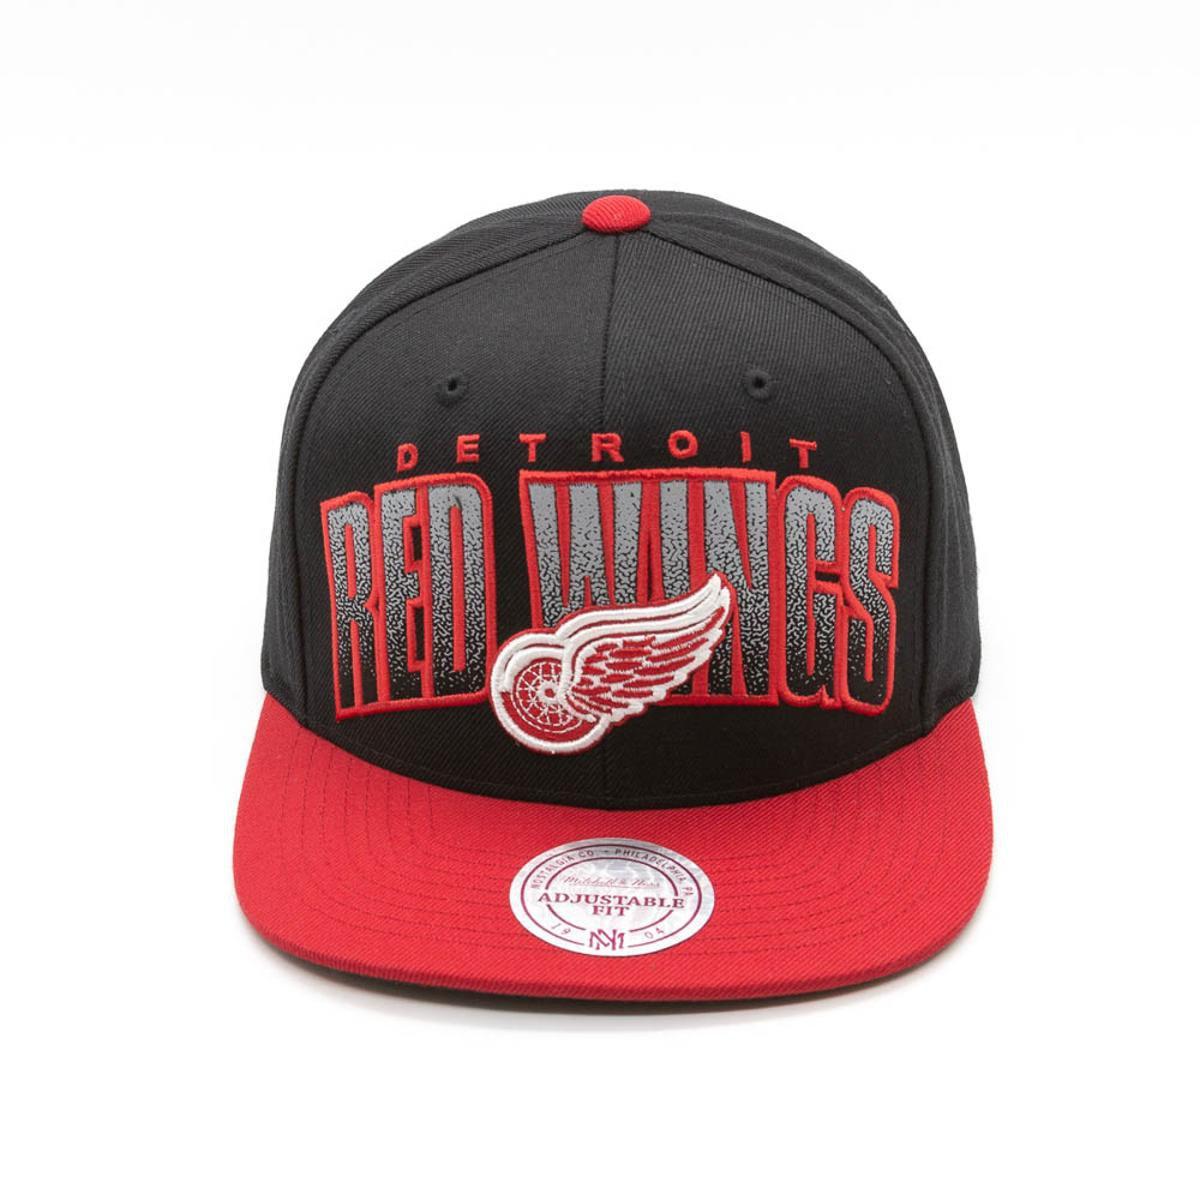 456b21dcd2f76 Boné Mitchell   Ness Double Bonus NHL Detreoit Red Wings Aba Reta - Preto -  Compre Agora